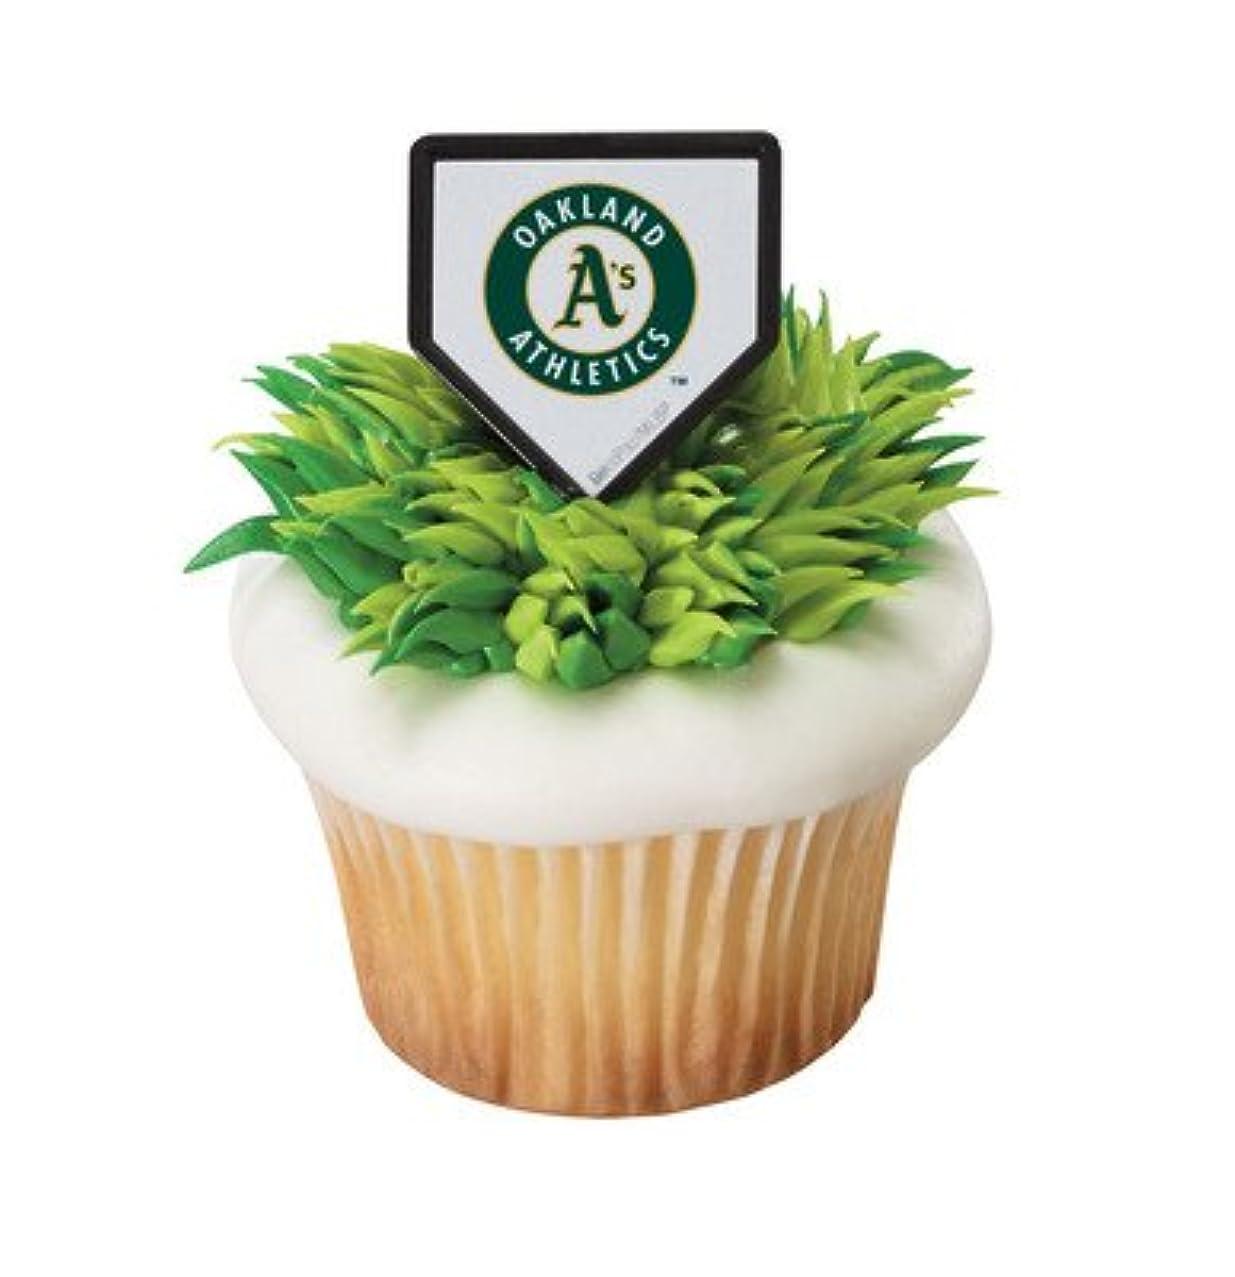 MLB Cupcake Topper Rings - Oakland Athletics